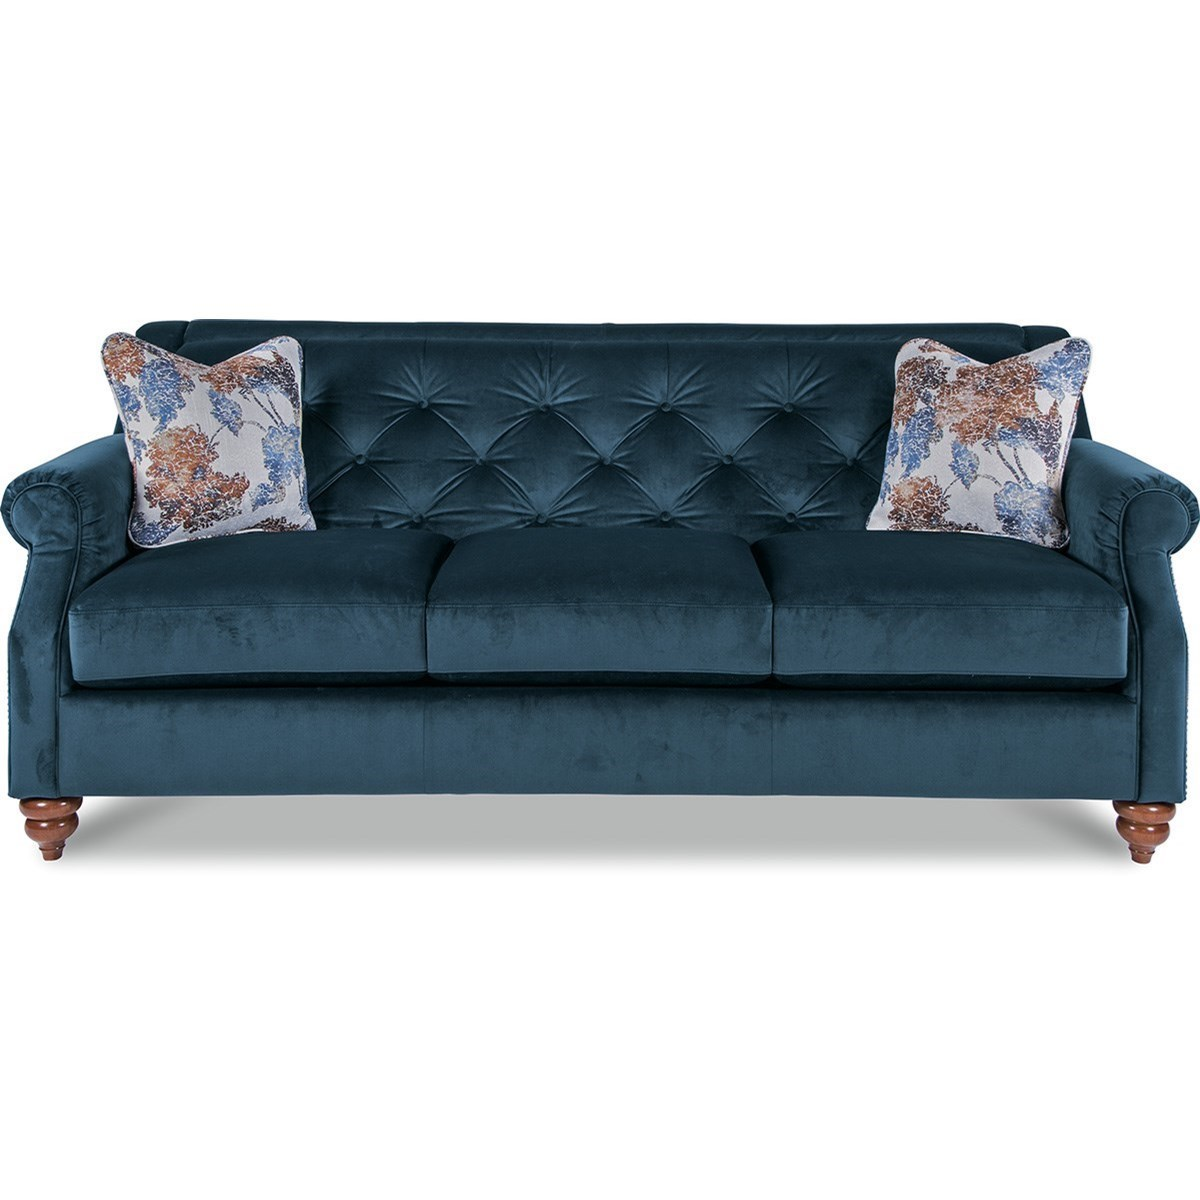 La Z Boy Aberdeen Traditional Sofa with Tufted Seatback  : aberdeen 1445605977610604 b1jpgscalebothampwidth500ampheight500ampfsharpen25ampdown from www.morrisathome.com size 500 x 500 jpeg 30kB